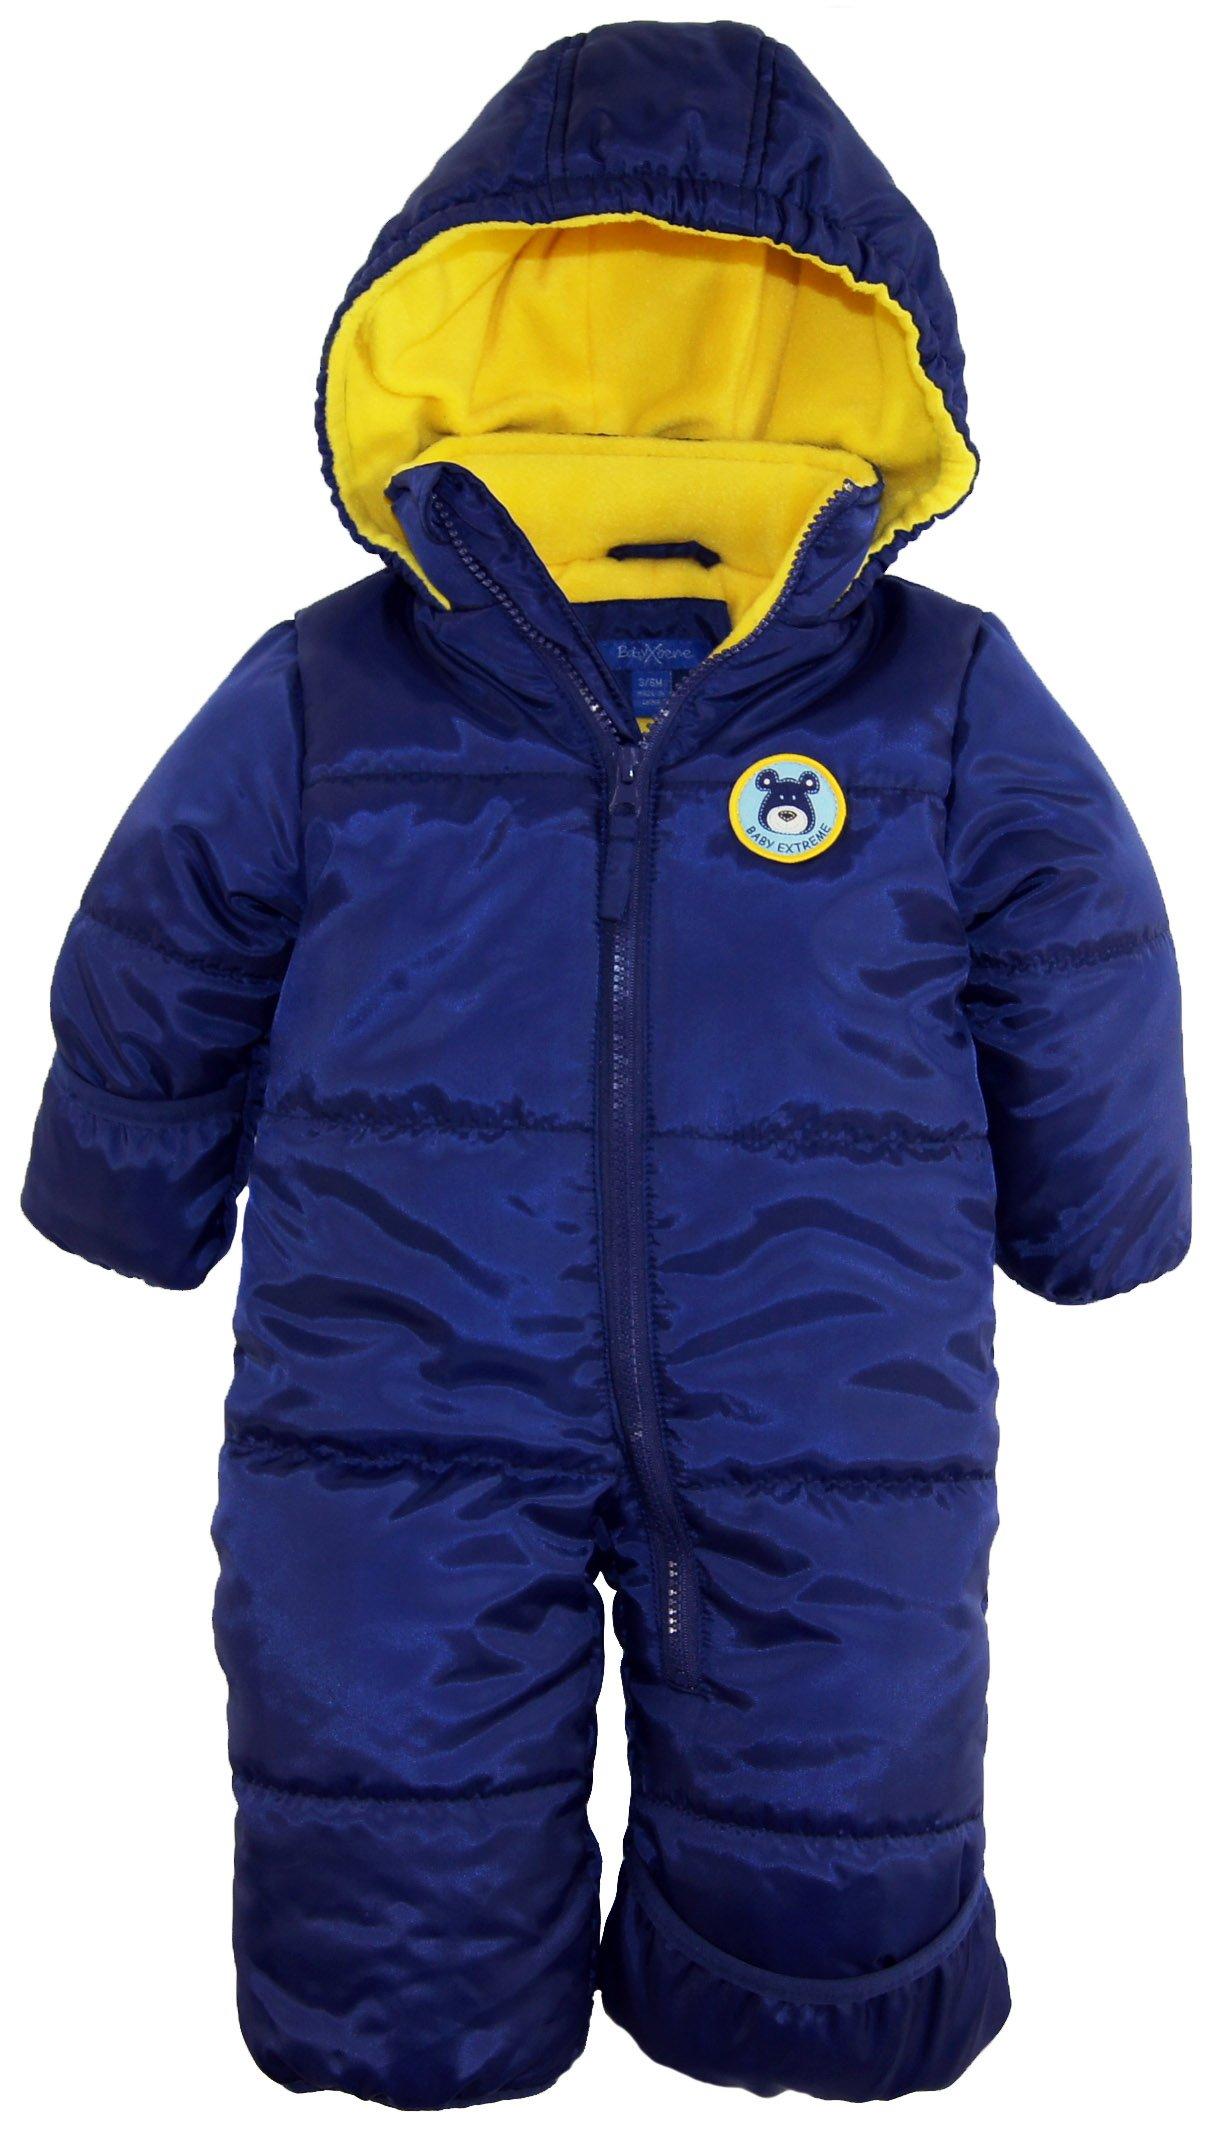 iXtreme Baby Boys Newborn Cute Teddy Bear One Piece Puffer Winter Snowsuit, Navy, 3/6 Months